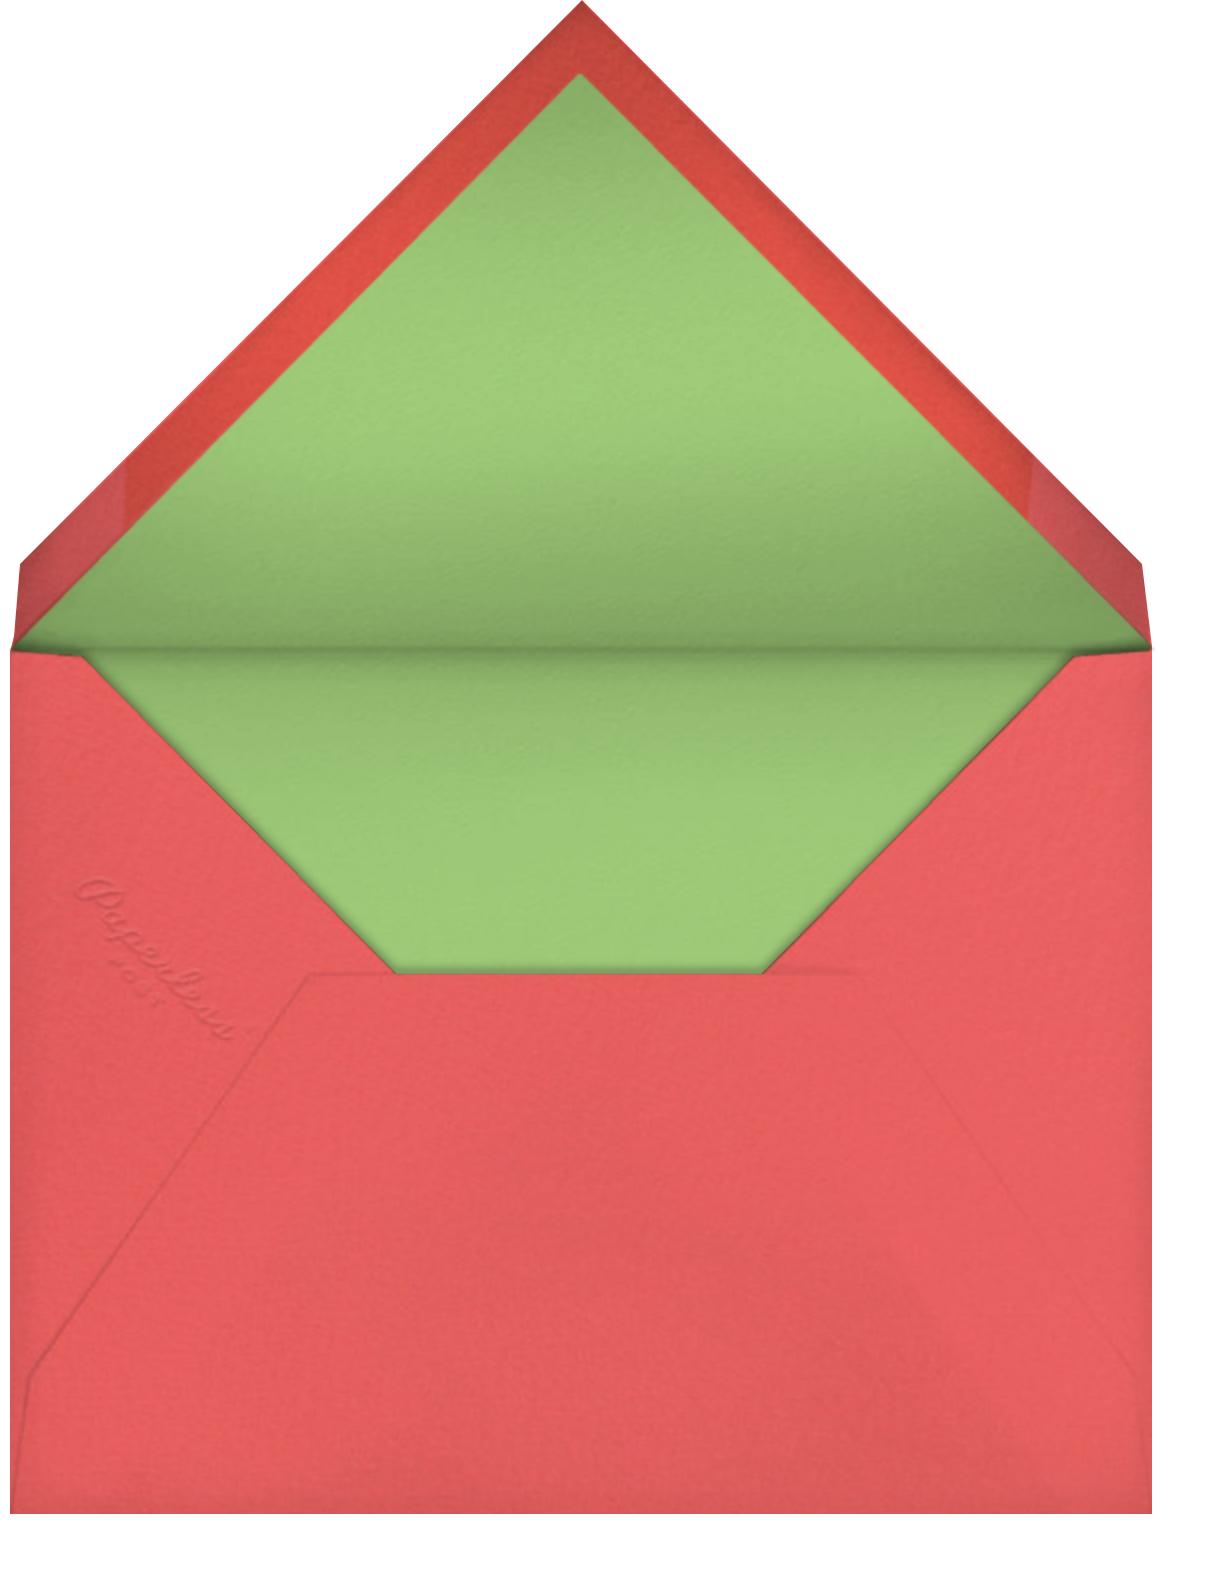 Long Stem Thank You (Blanca Gómez) - Red Cap Cards - Thank you - envelope back